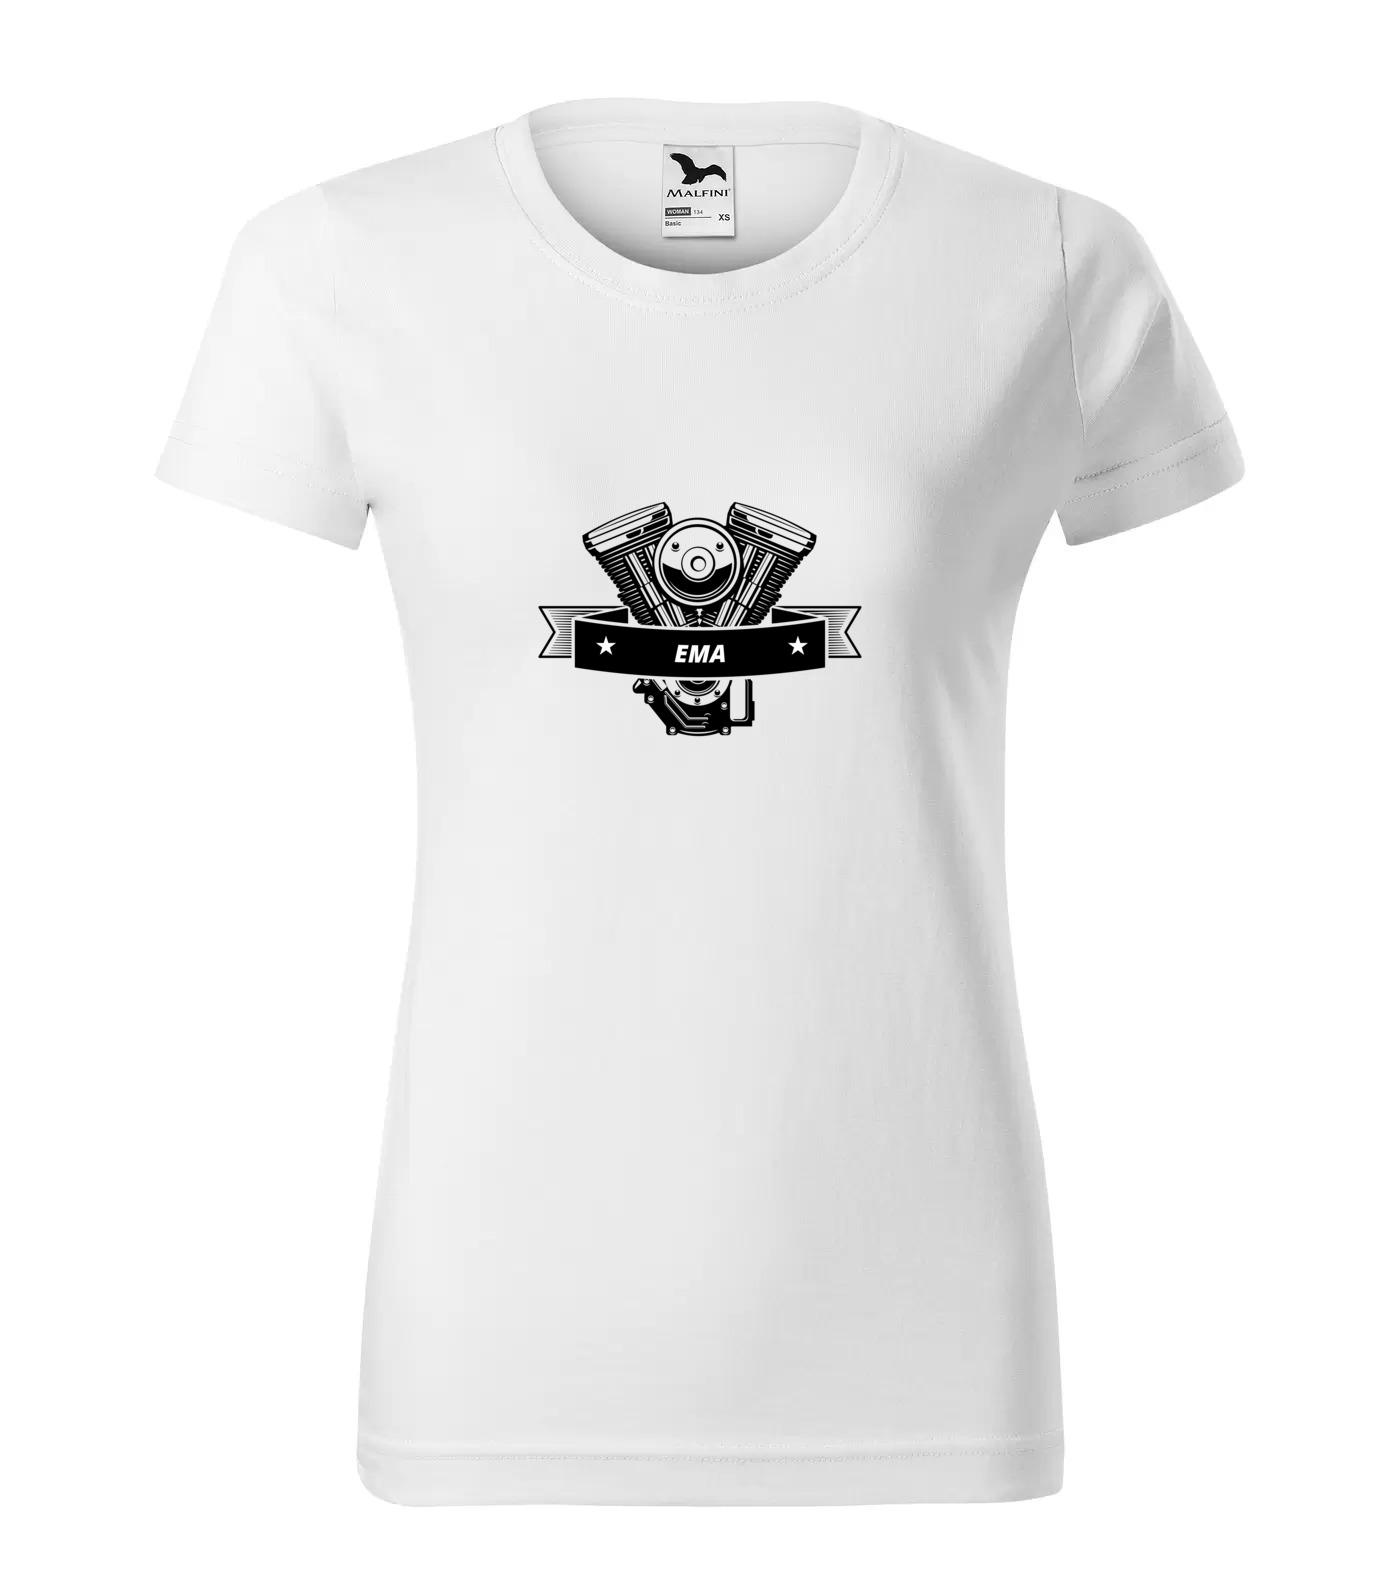 Tričko Motorkářka Ema